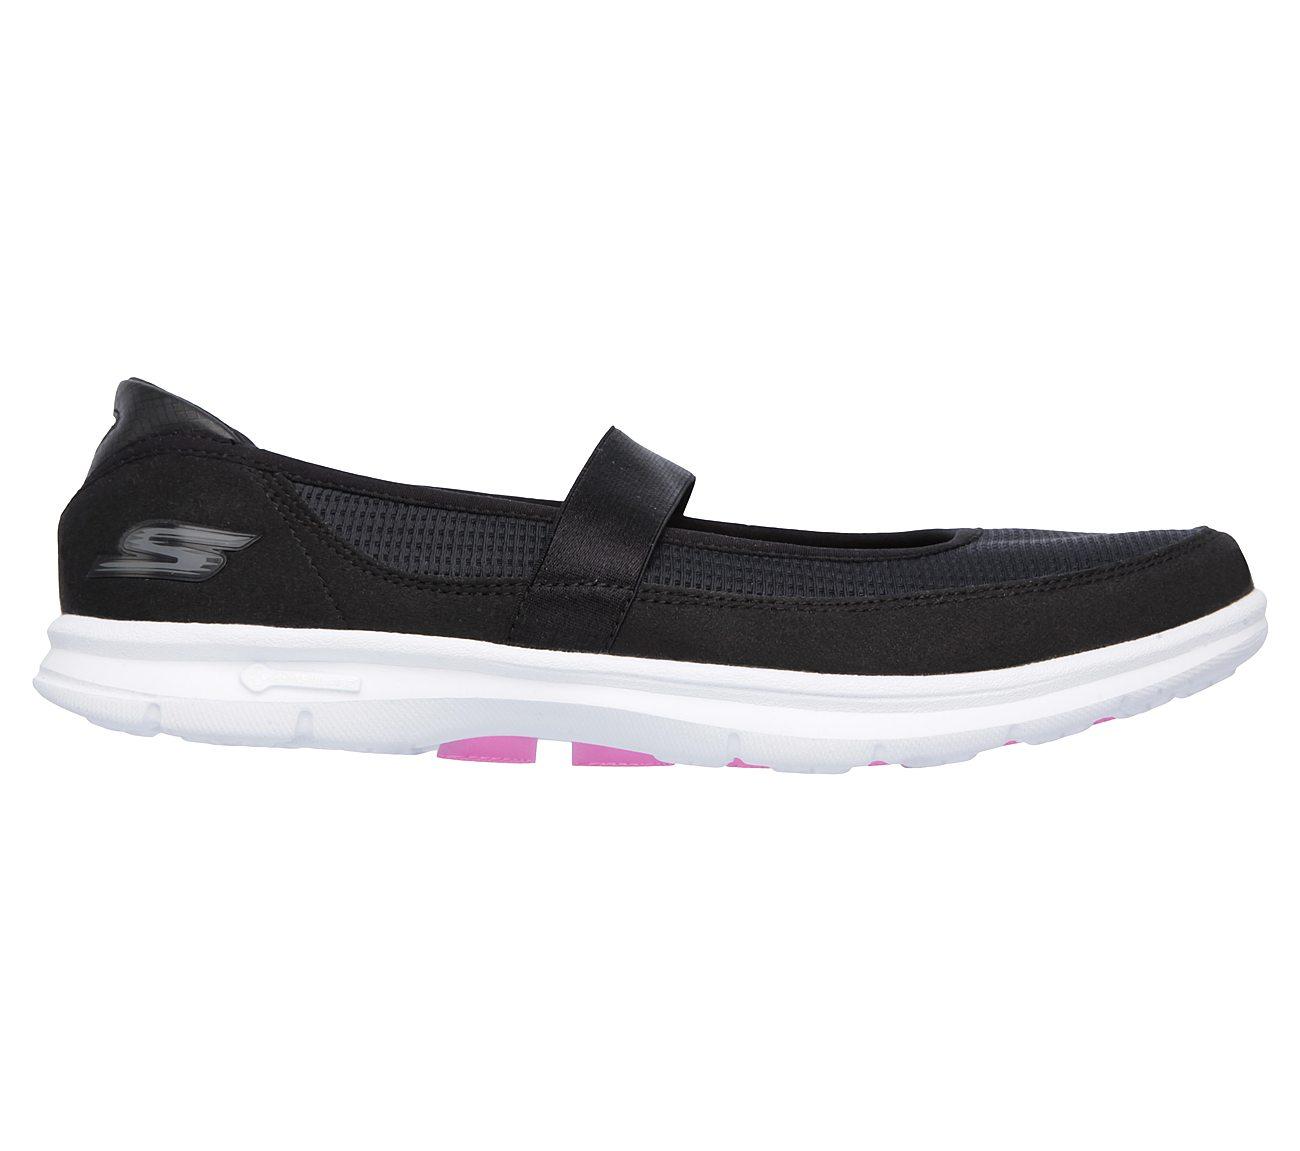 Buy SKECHERS Skechers GO STEP - Original Skechers On the GO Shoes ... 8d802b28c088